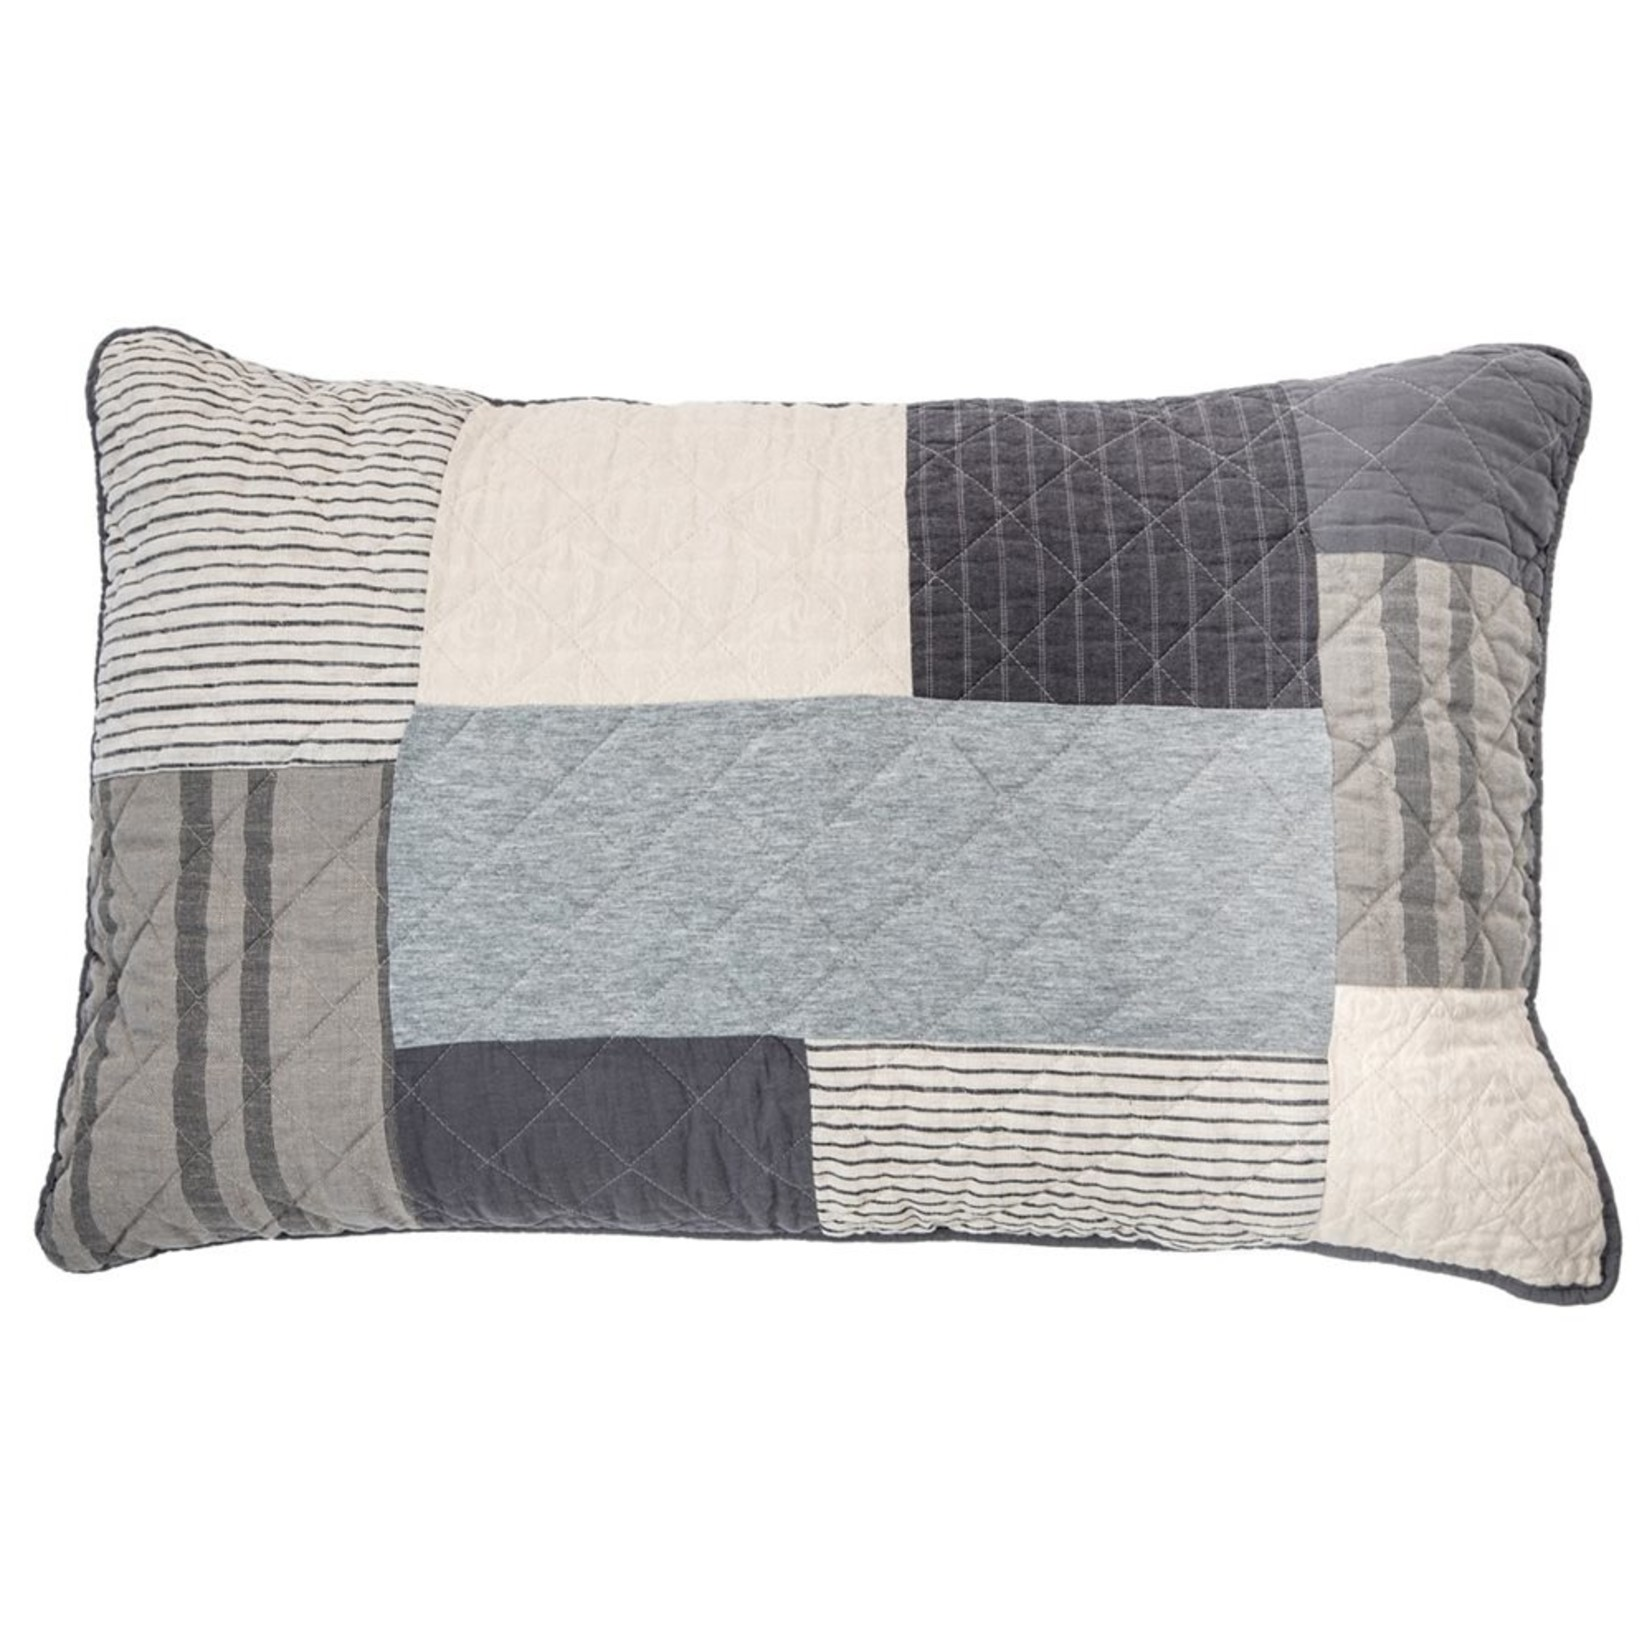 Brunelli Harry Pillow Sham